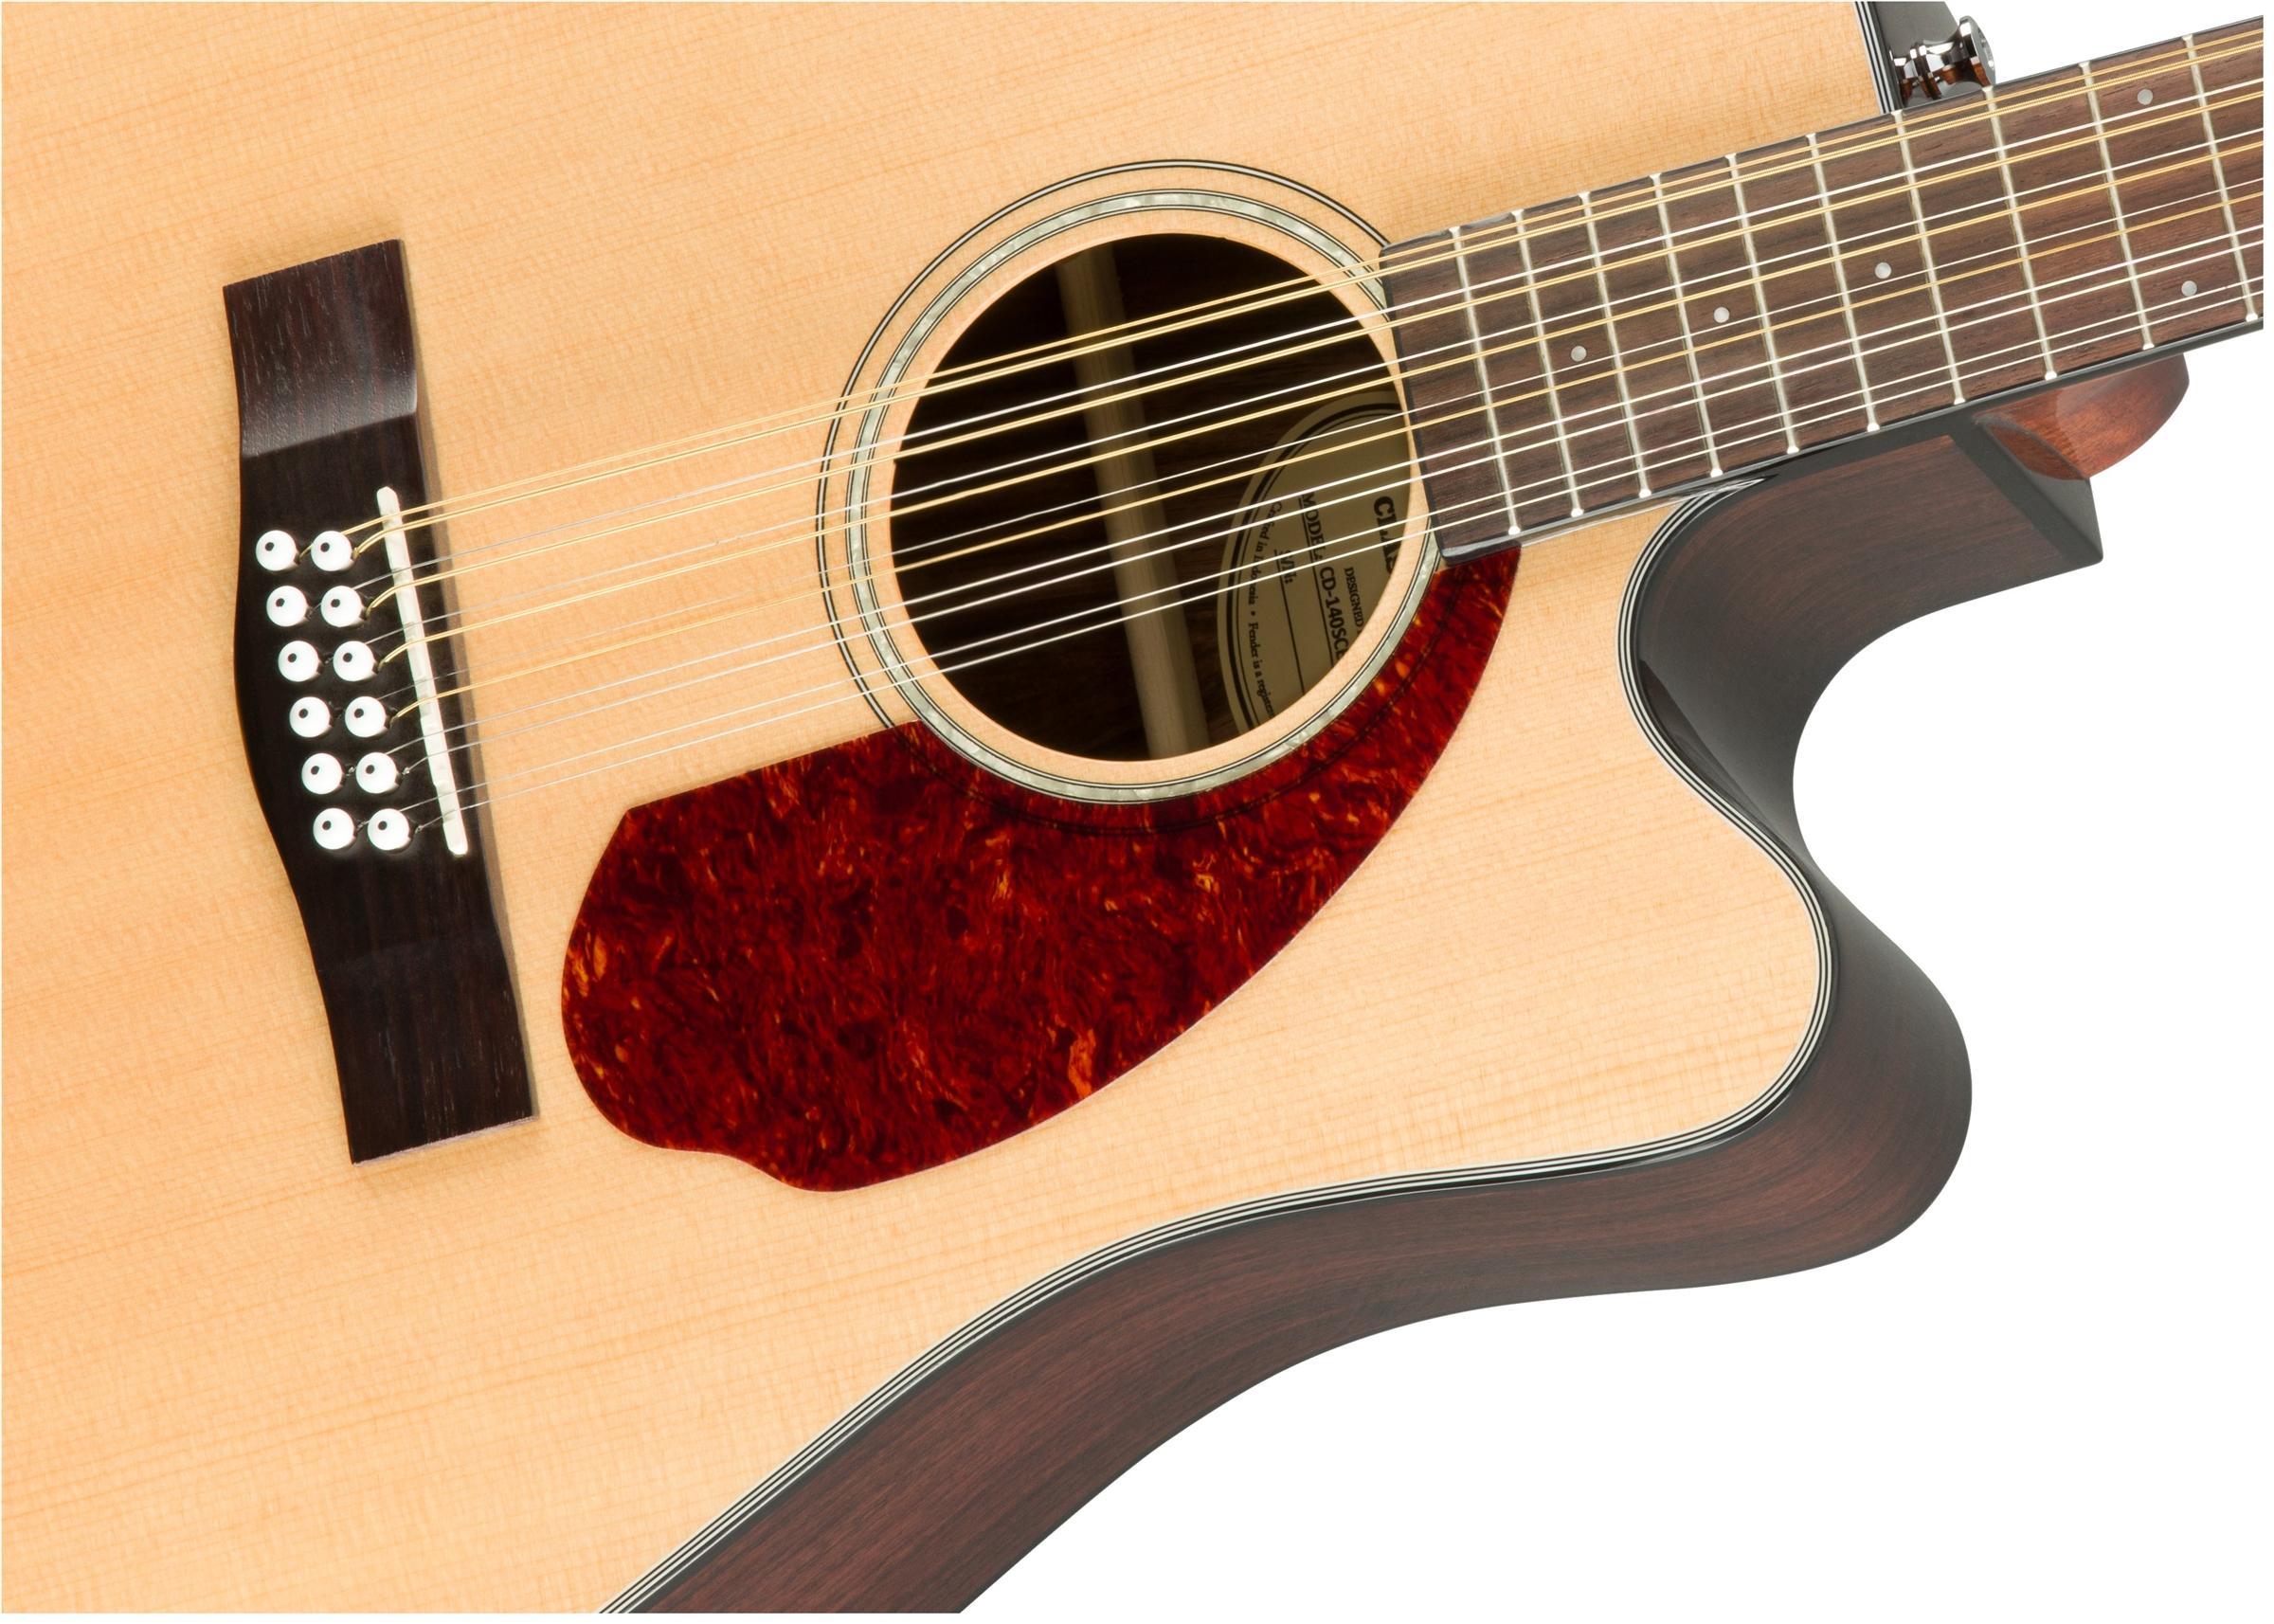 cd 140sce 12 string acoustic guitars Fender Stratocaster XII 12 String cd 140sce 12 string